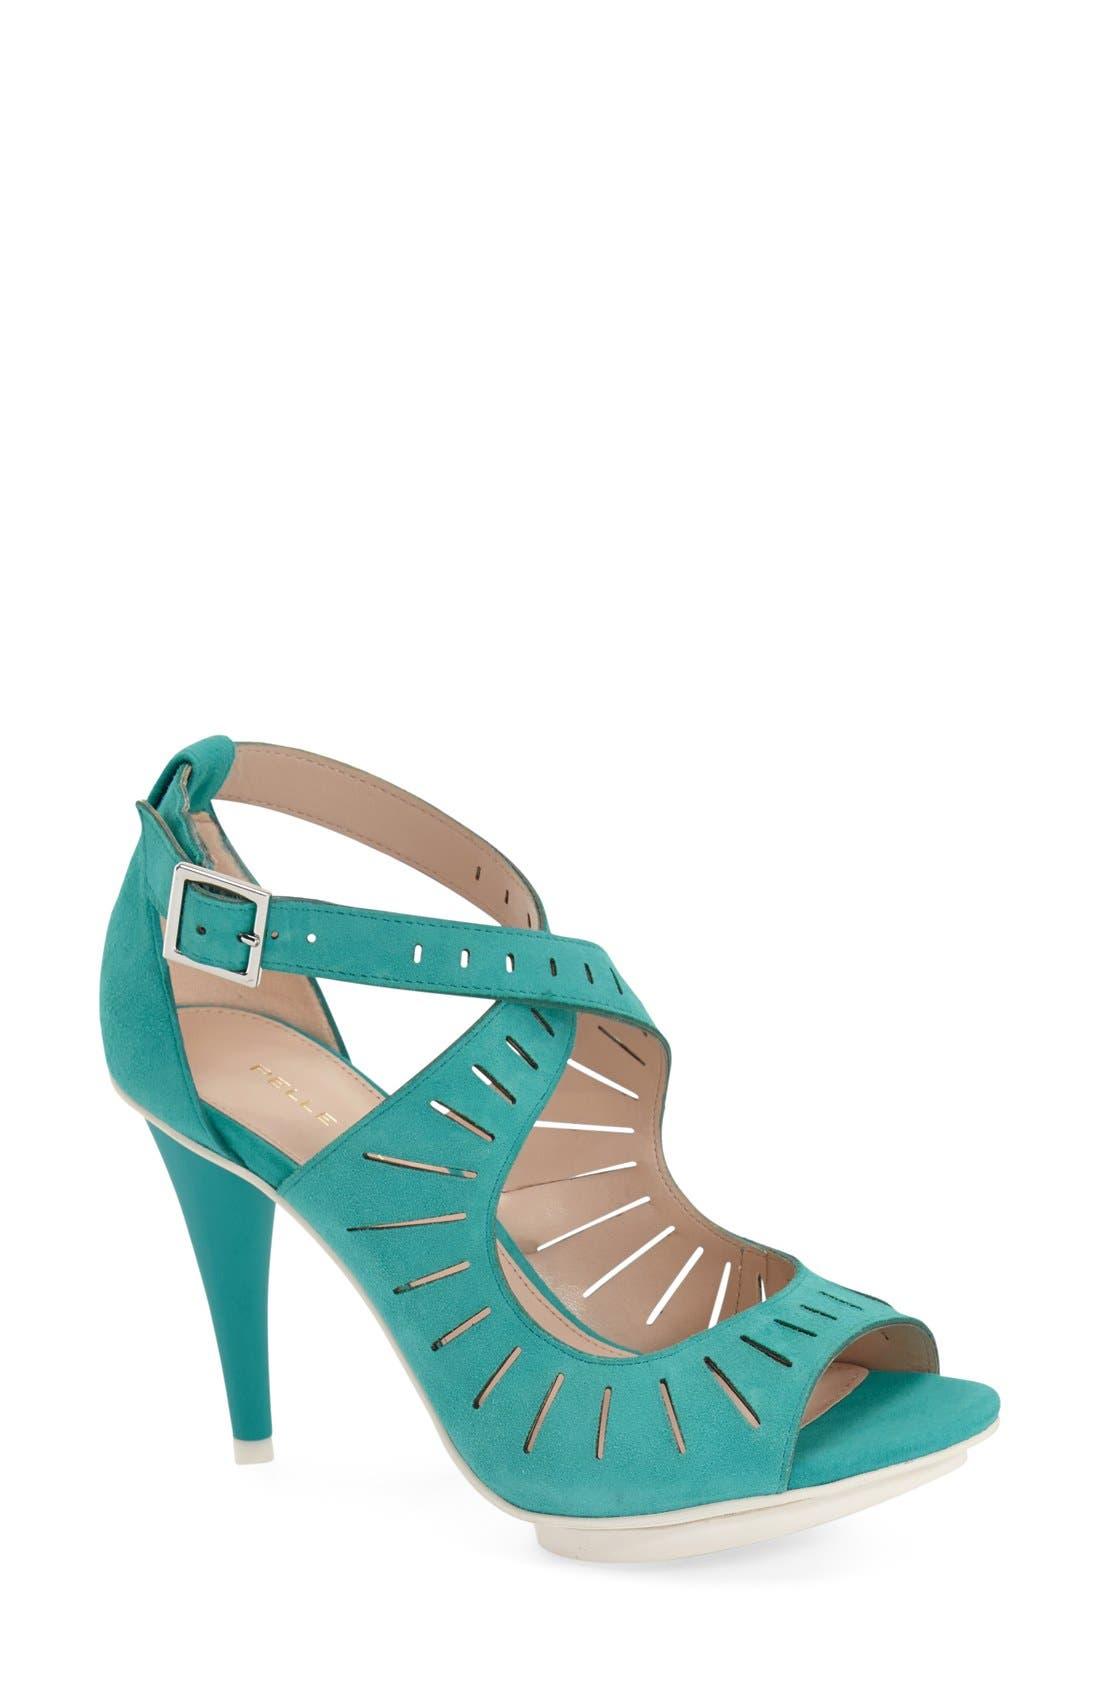 Alternate Image 1 Selected - Pelle Moda 'Menlo' Cutout Sandal (Women)